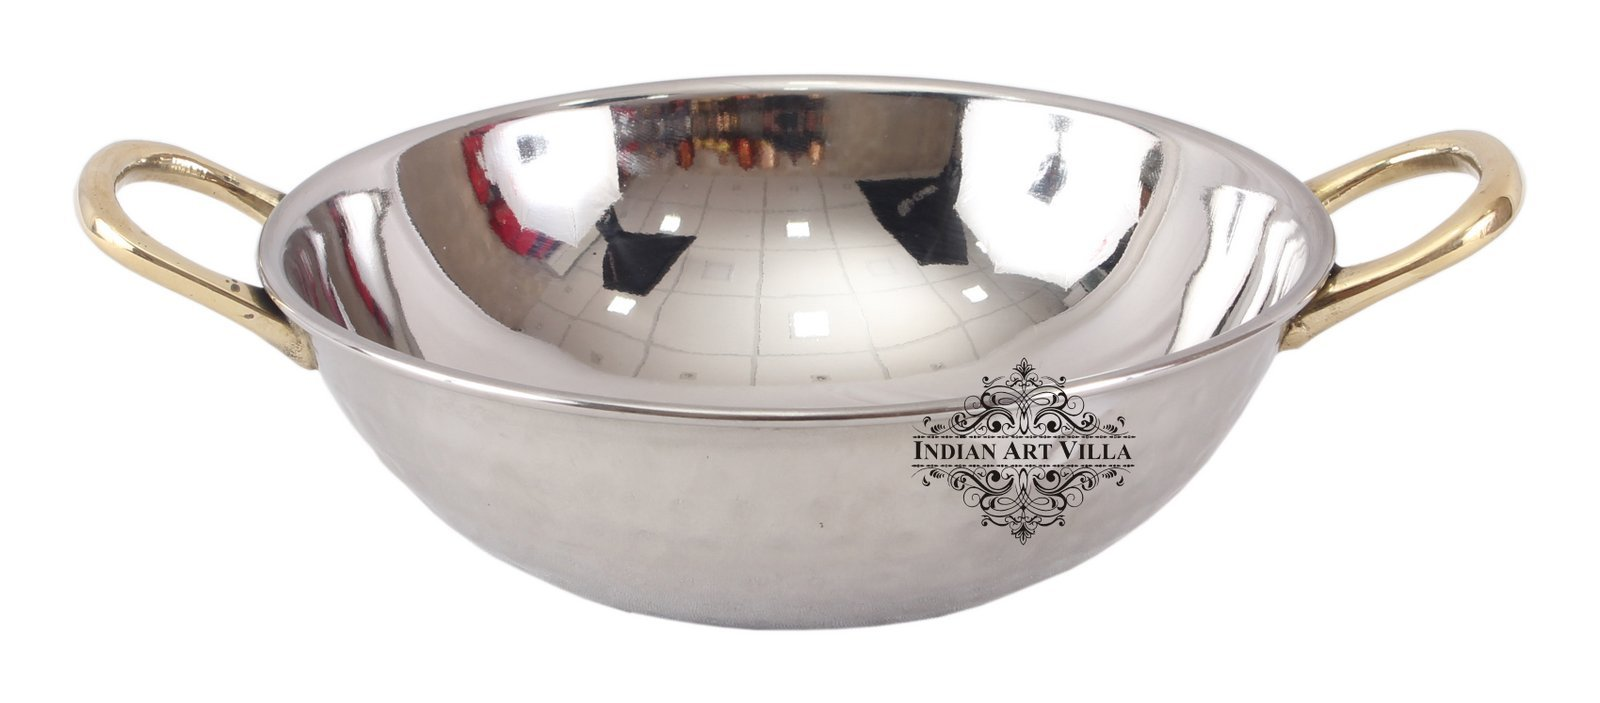 IndianArtVilla S/S Double Wall Kadai Wok Brass Round Handle|690 ML Capacity|Serving Dishes